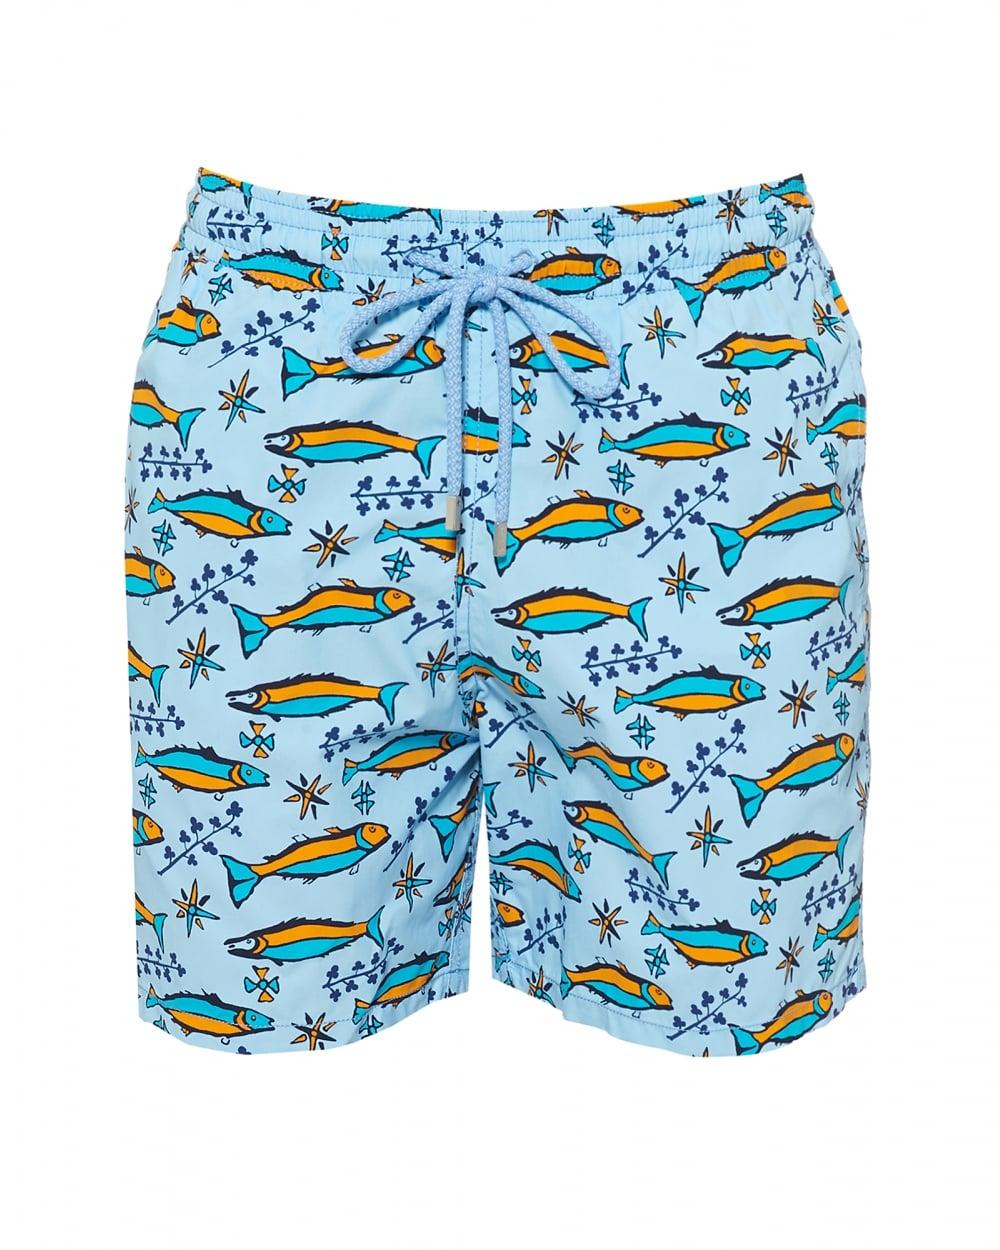 3c4b097fc8 Vilebrequin Mens Moorea Swimshort, Blue Sardine Print Swimming Trunks